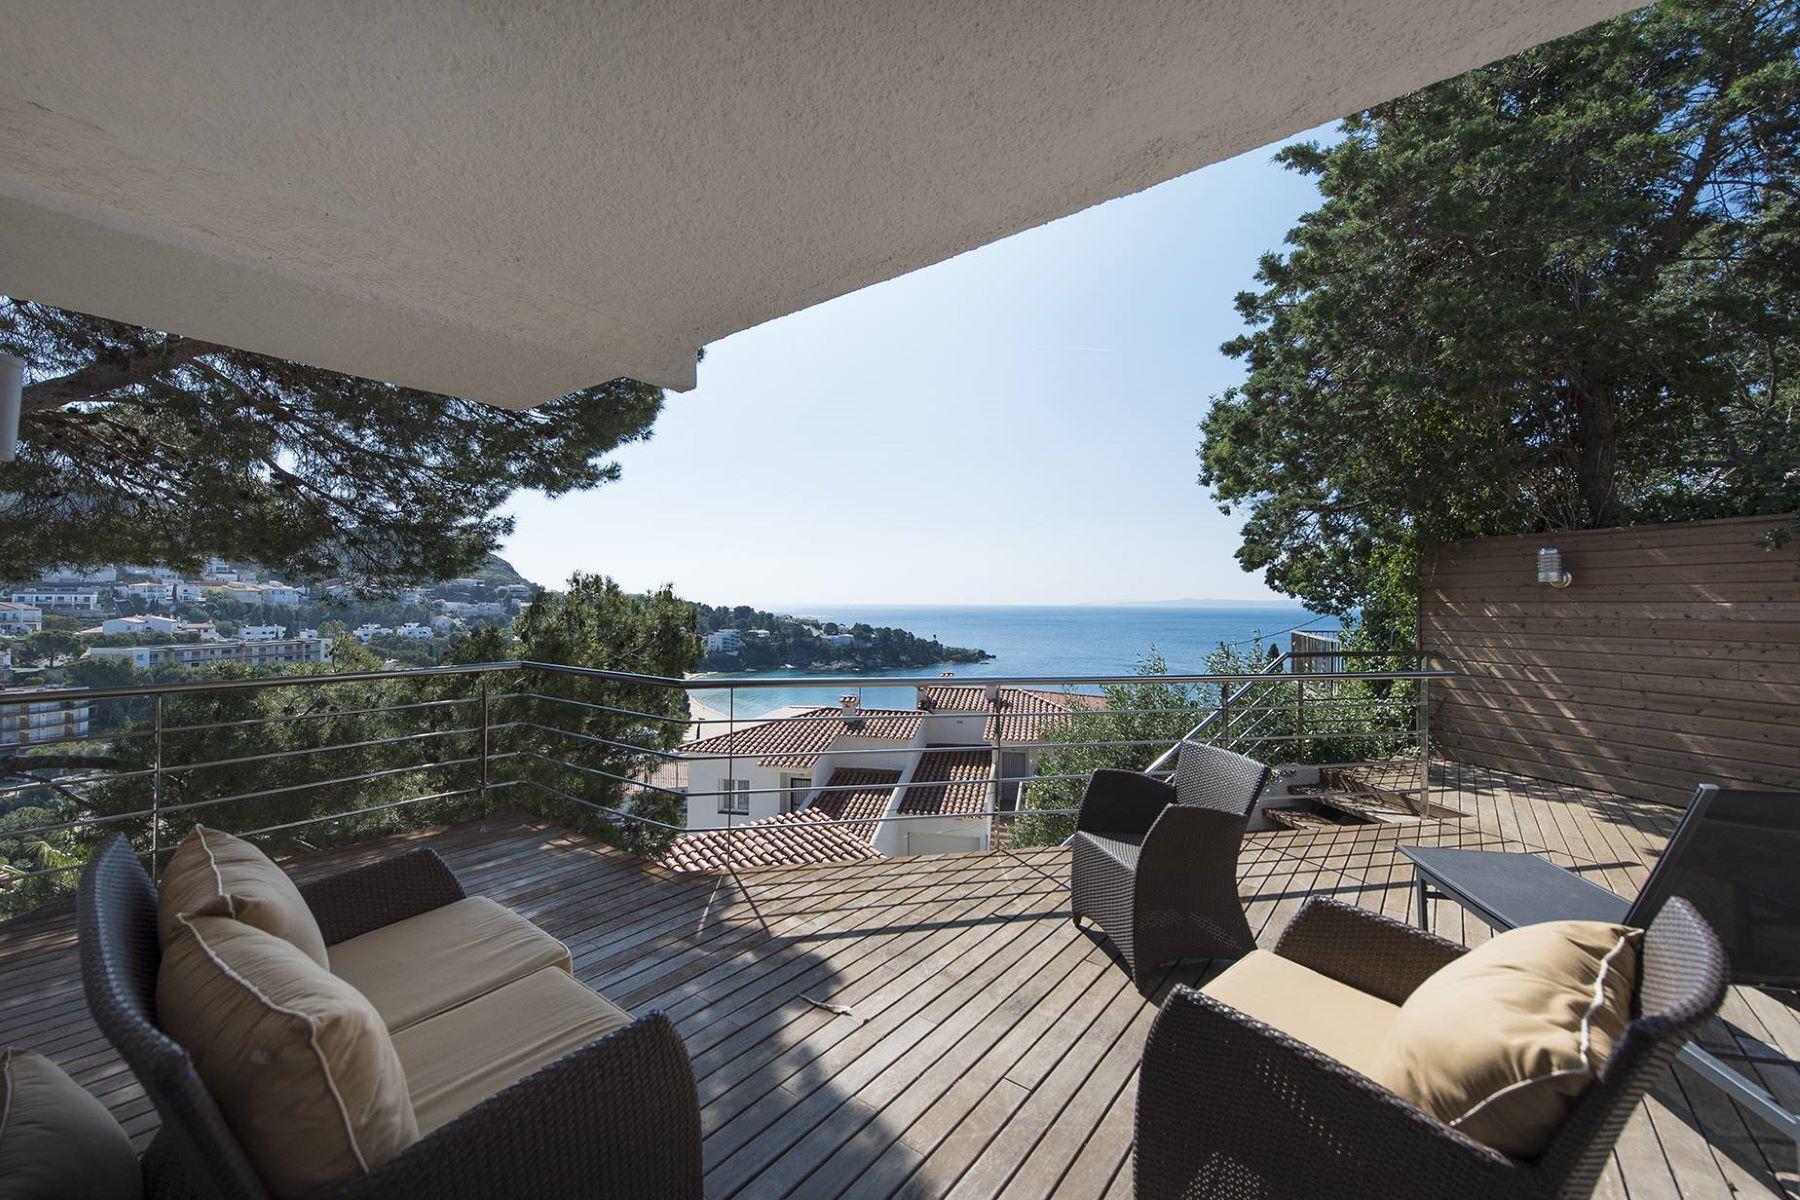 Single Family Home for Sale at Pleasant property near Almadrava beach, sea view Roses. Roses, Costa Brava, 17480 Spain